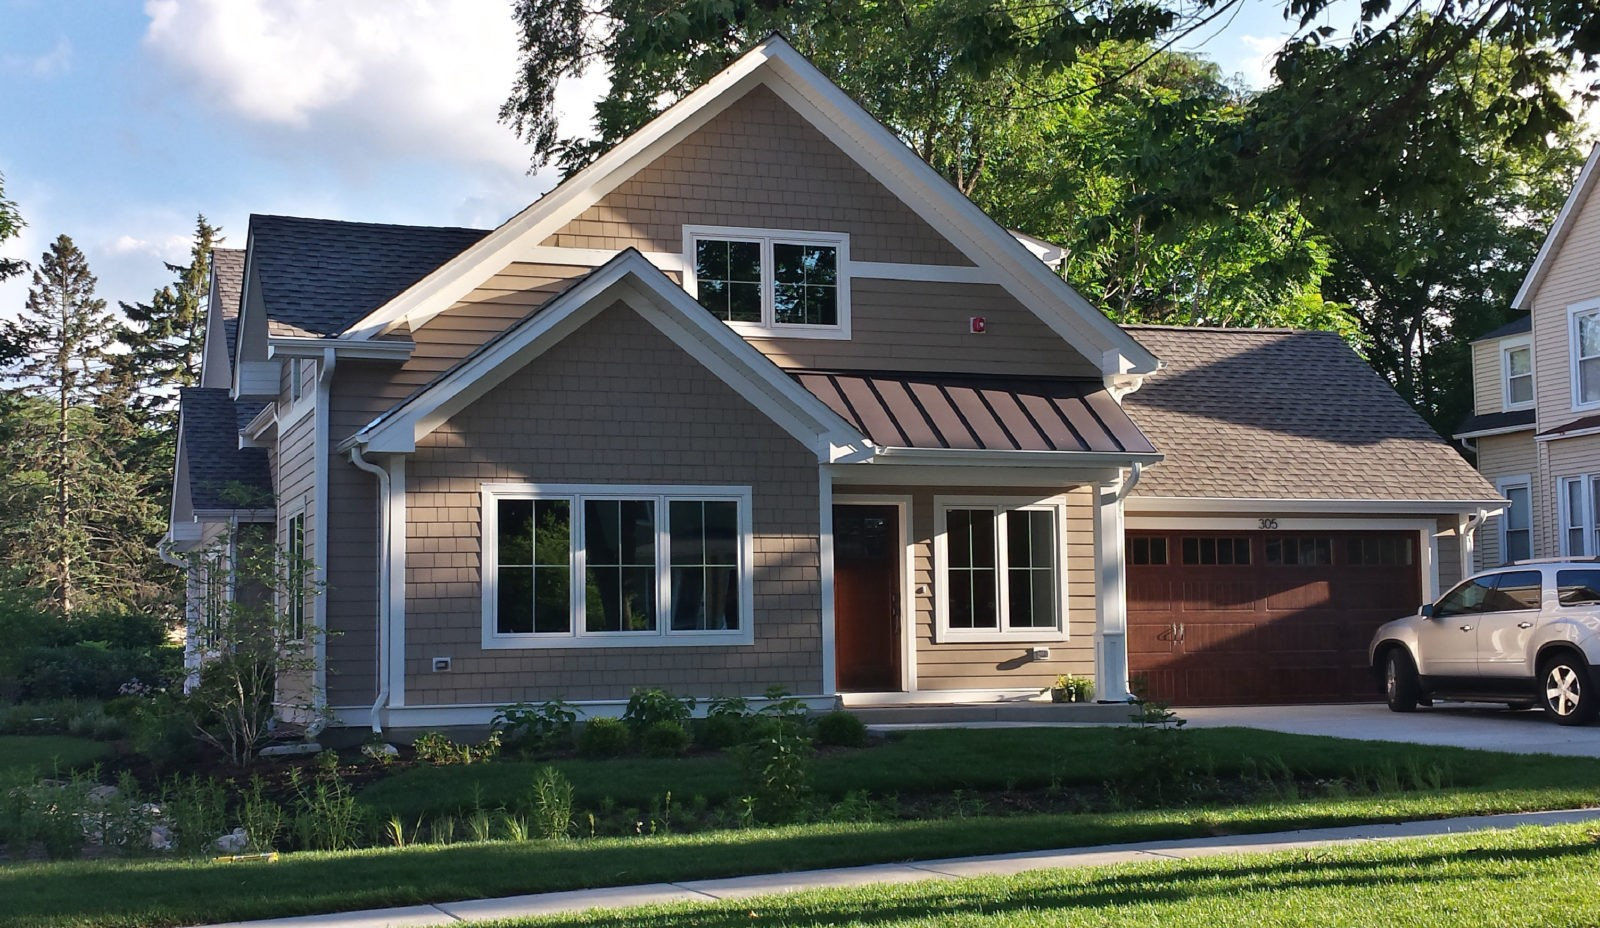 Smart Haus leed platinum smarthaus duplex libertyville il smart haus